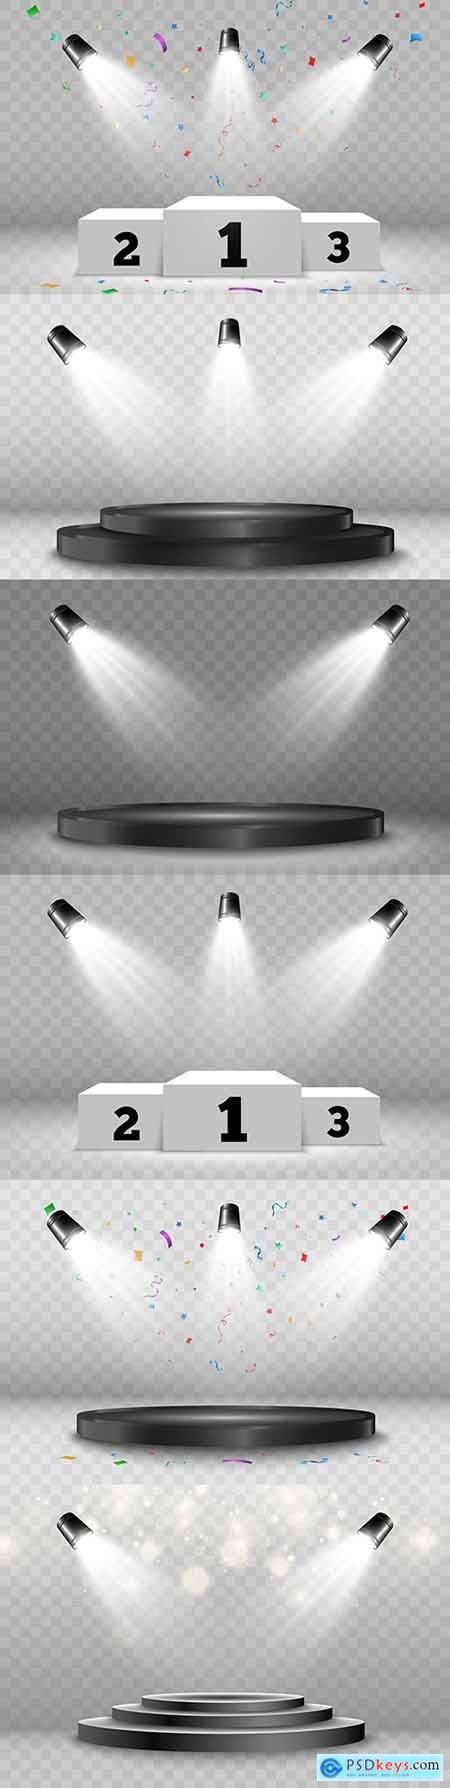 Podium illuminated with spotlights on transparent background